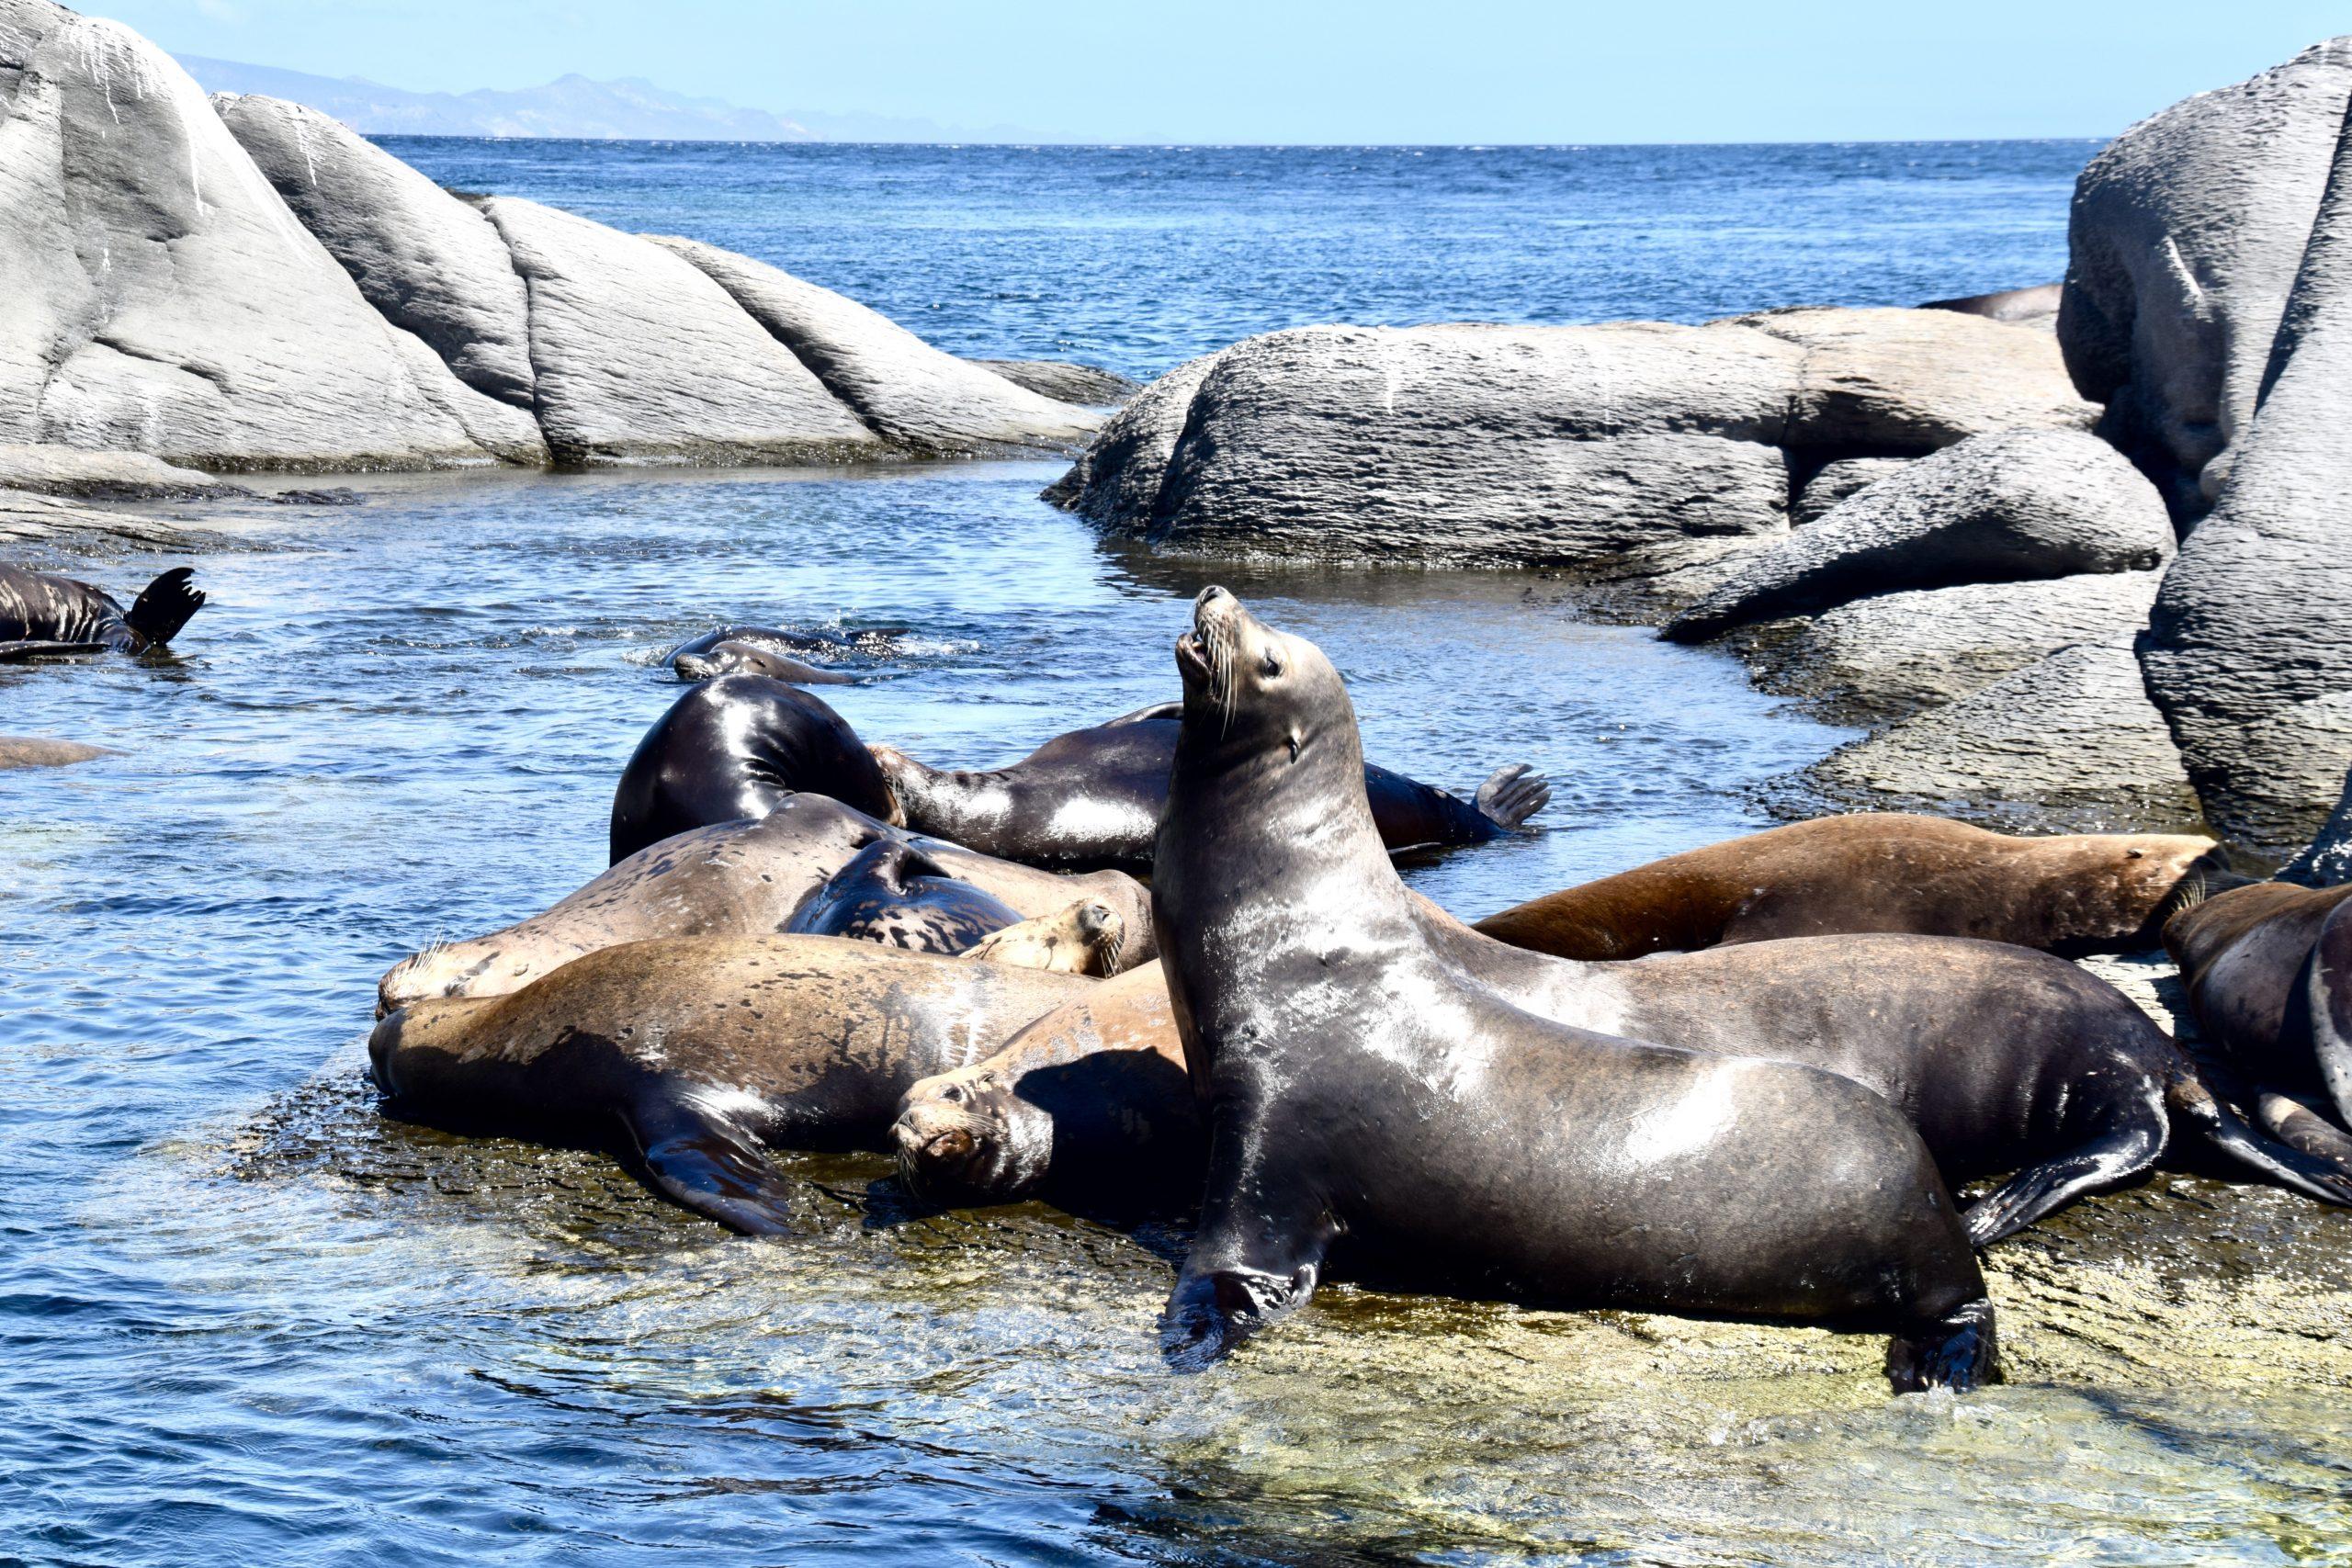 sea lions basking in the sun along the rocky coastline of Loreto, Mexico